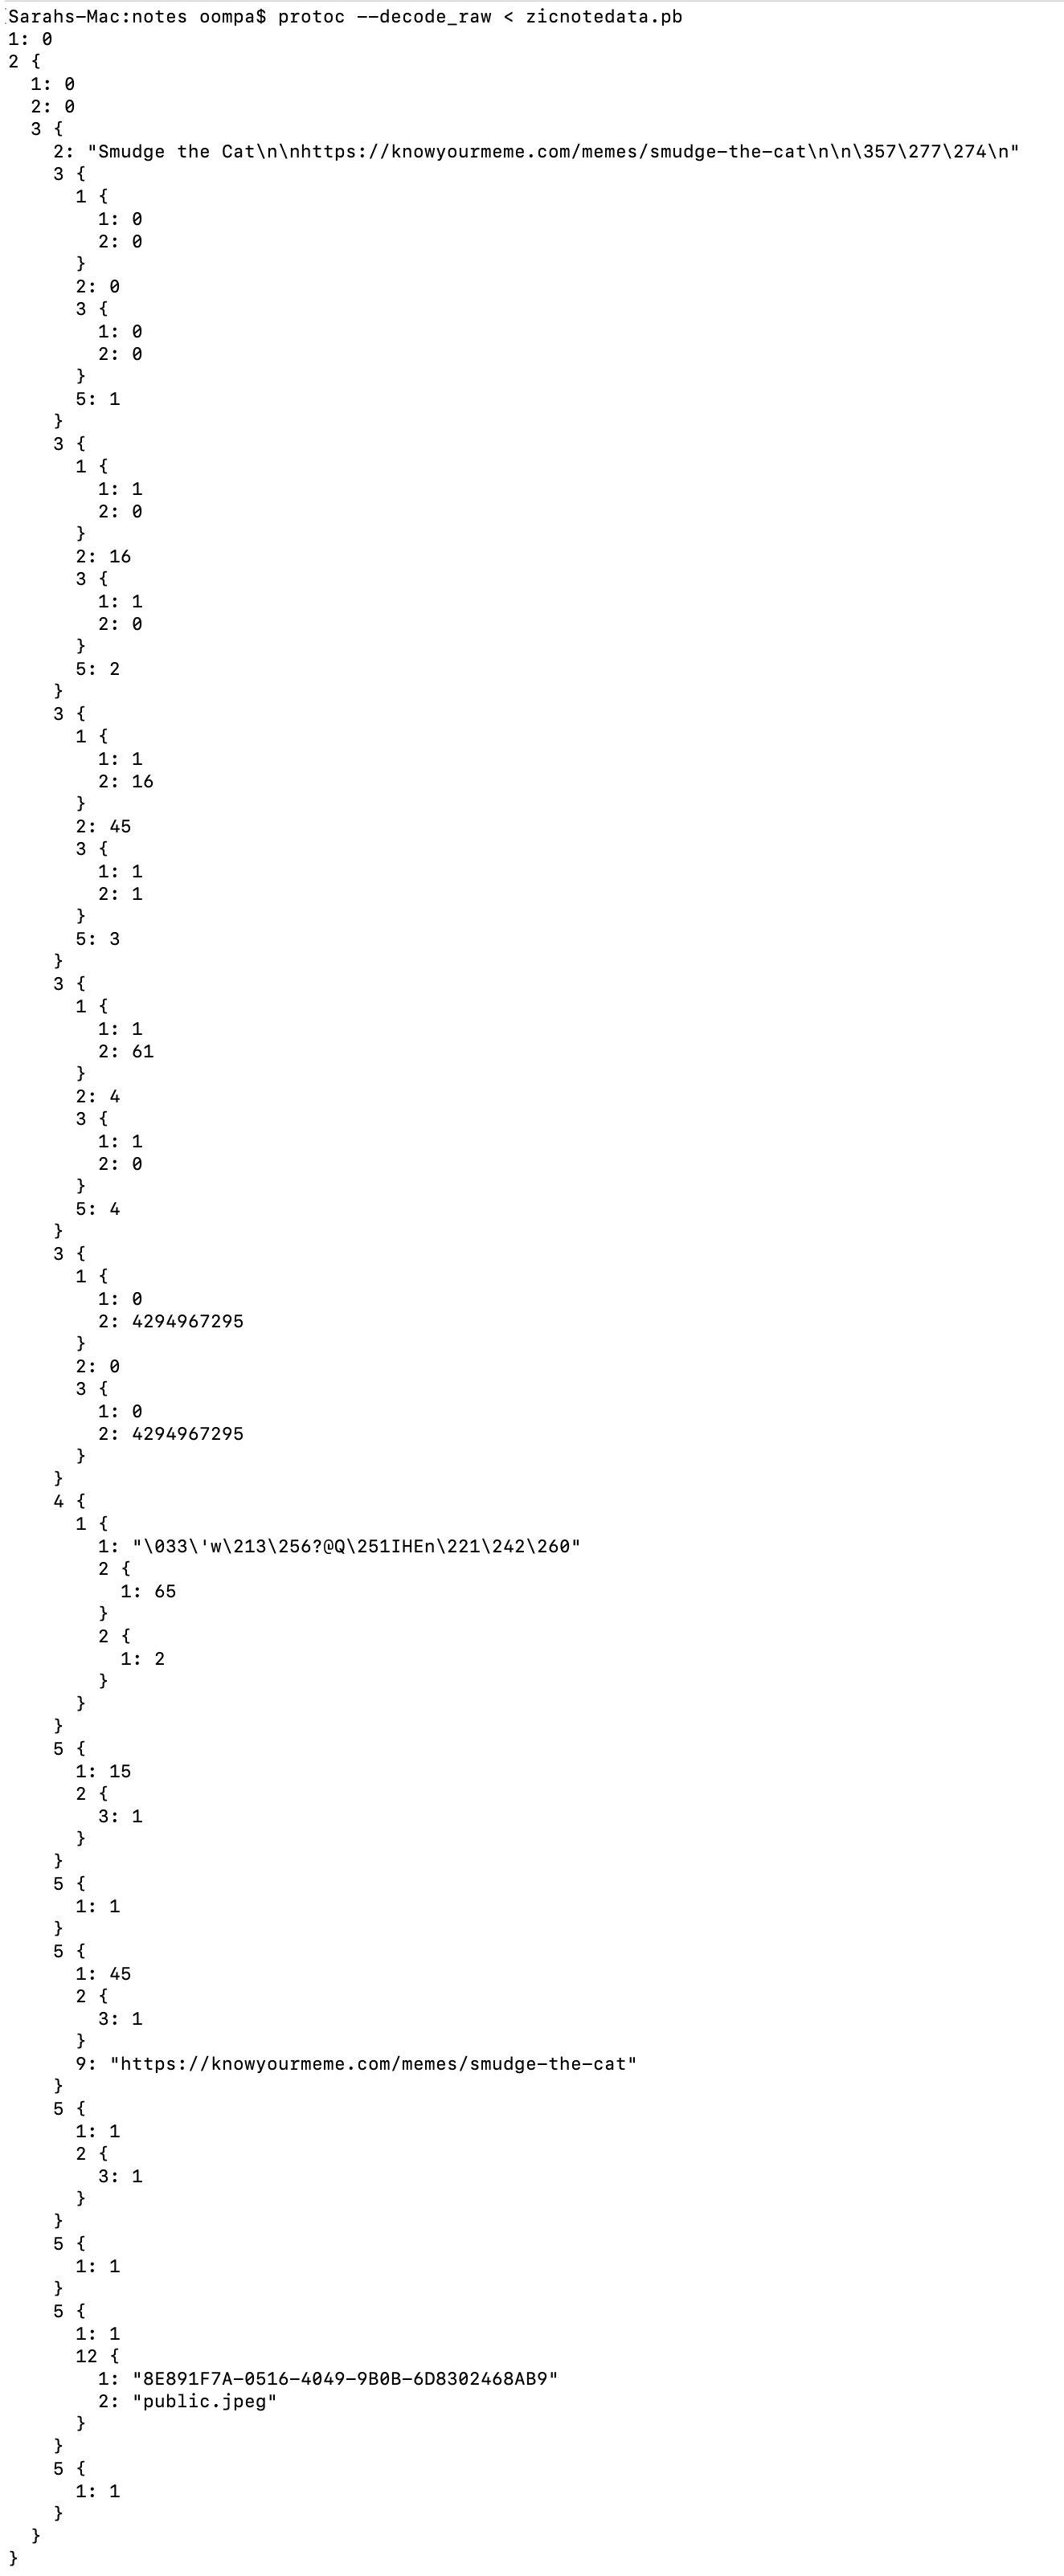 notes_pb_protoc.jpg